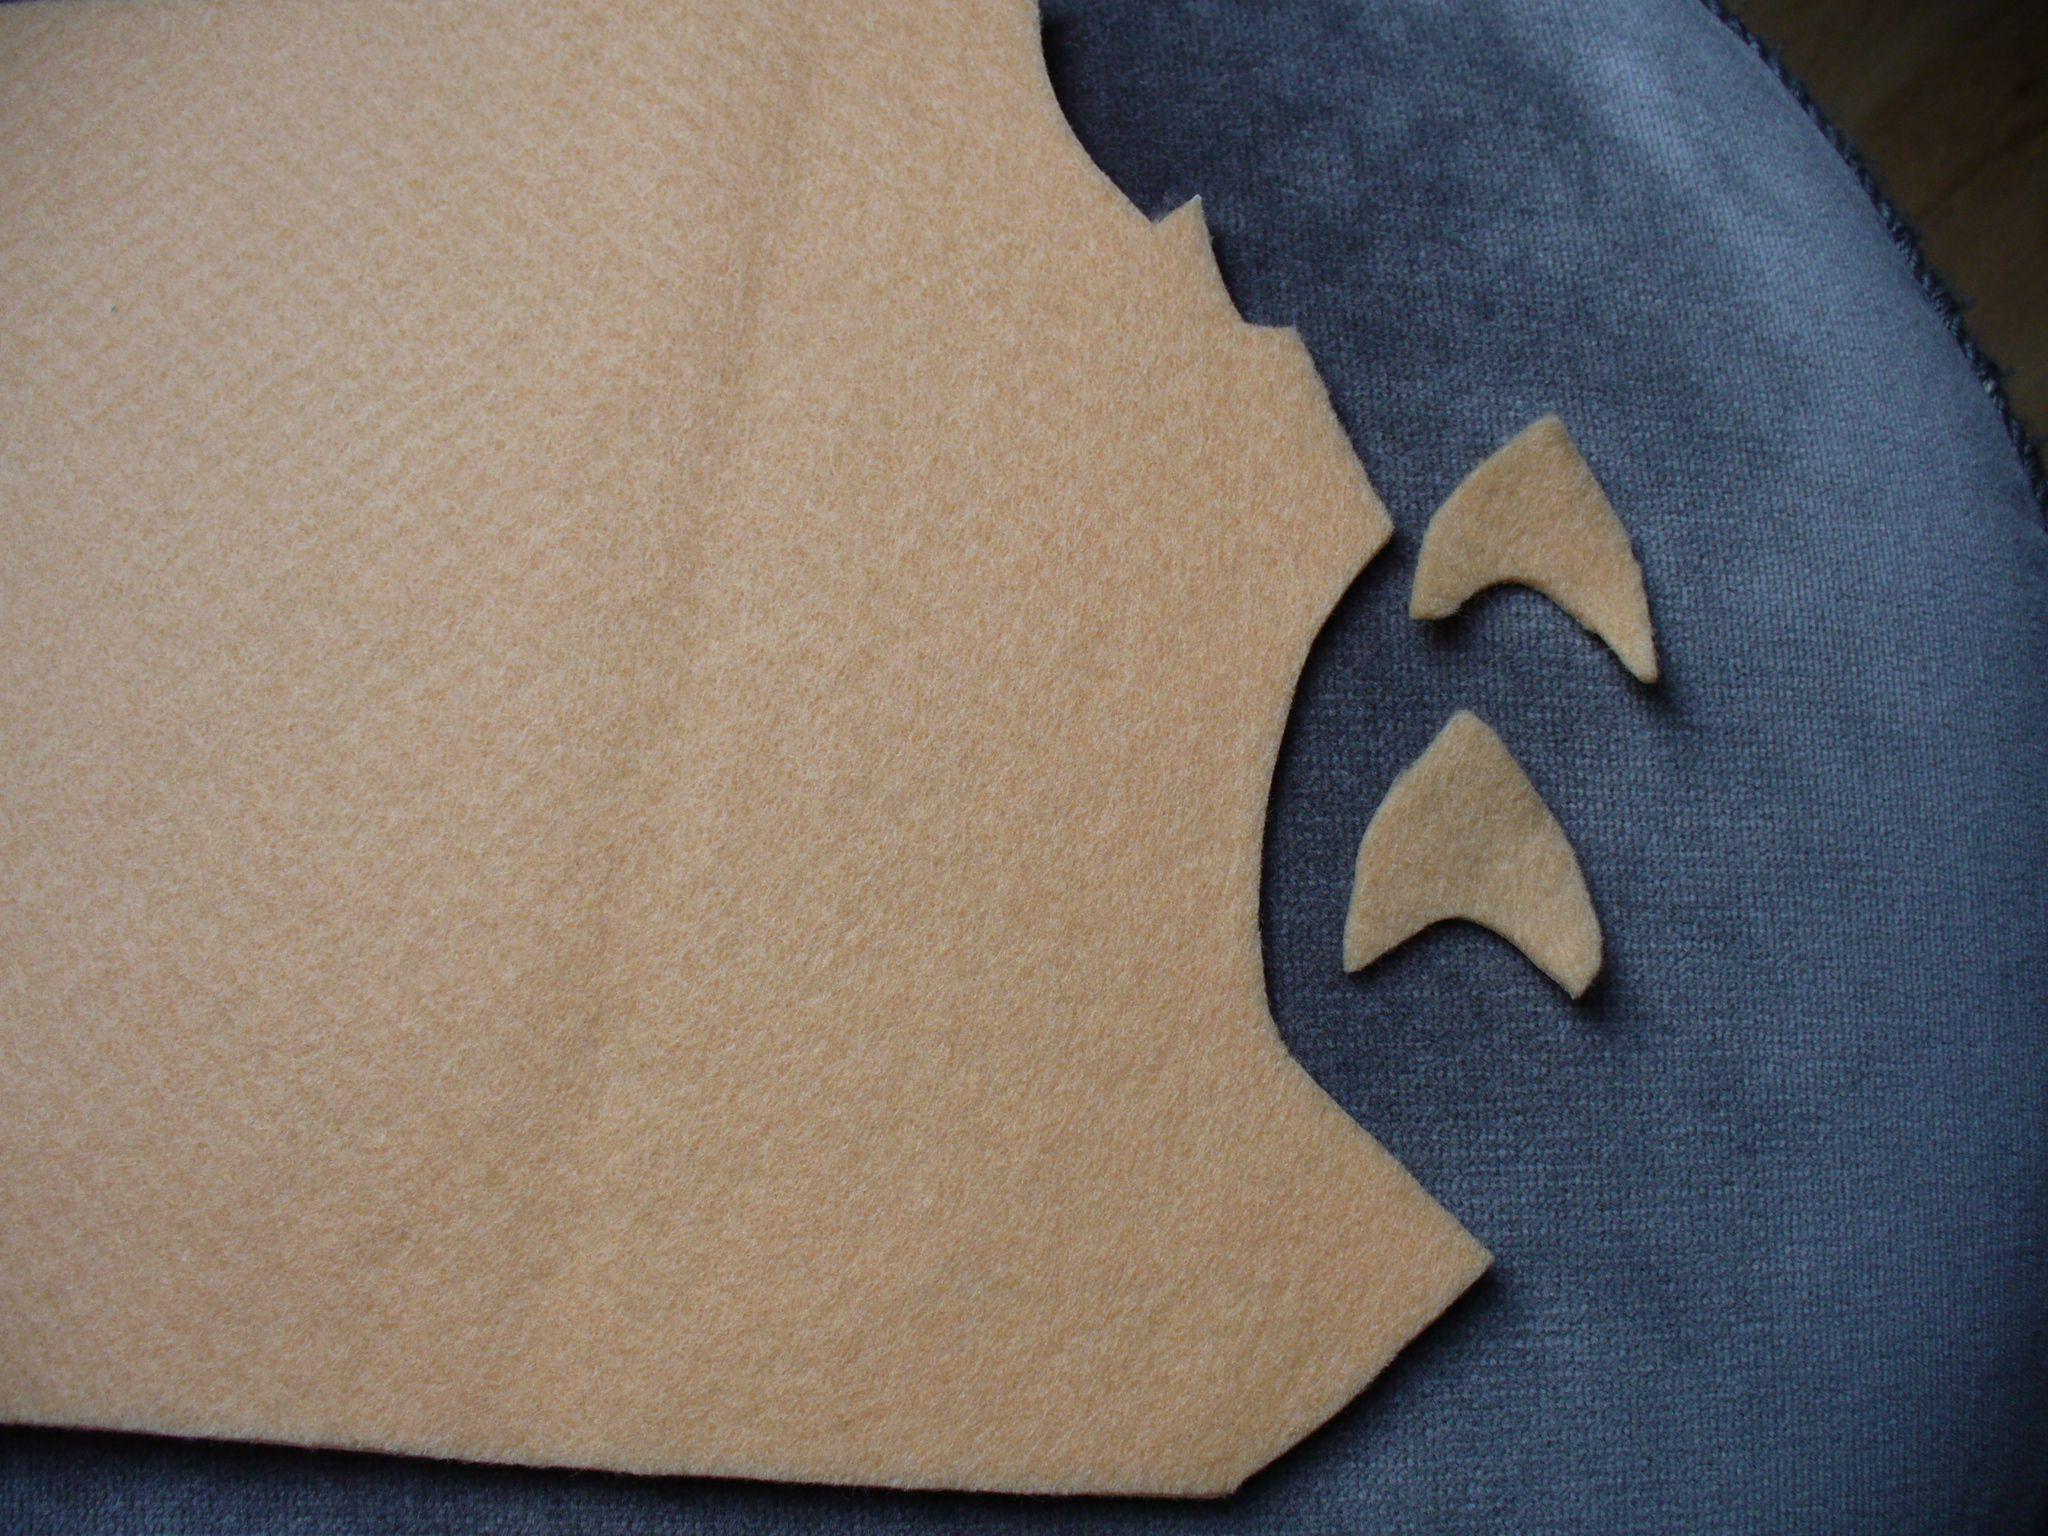 Pin on Legolas costume